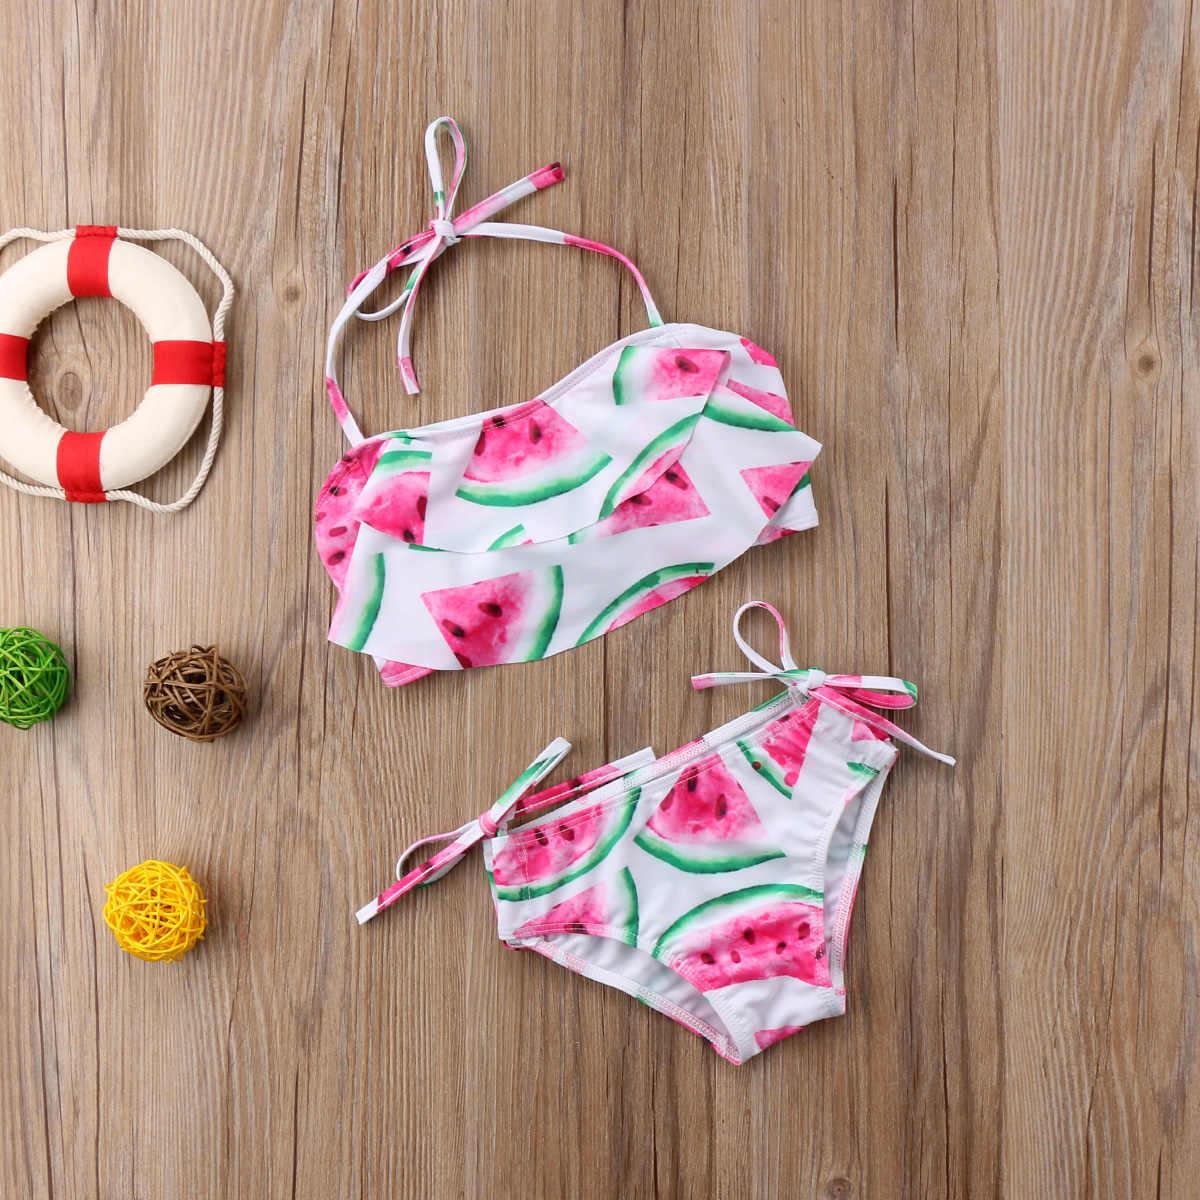 8d3c4de5f7e56 ... Kids Baby Girl Summer Watermelon Swimsuit Strap Halter Tops Swimming  Bottom 2PCS Bikini Set Beachwear Bathing ...